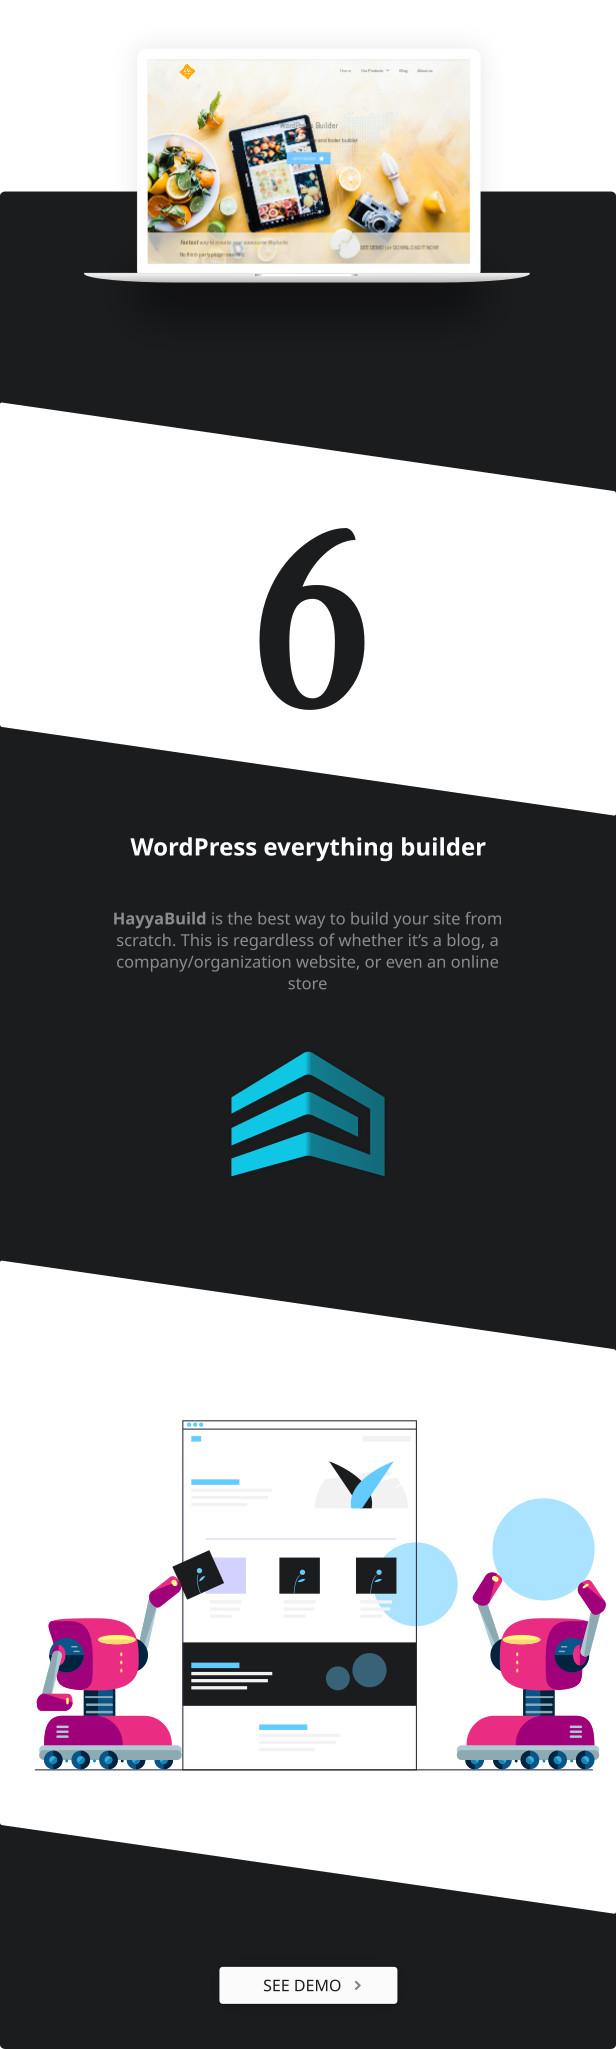 HayyaBuild wordpress builder plugin